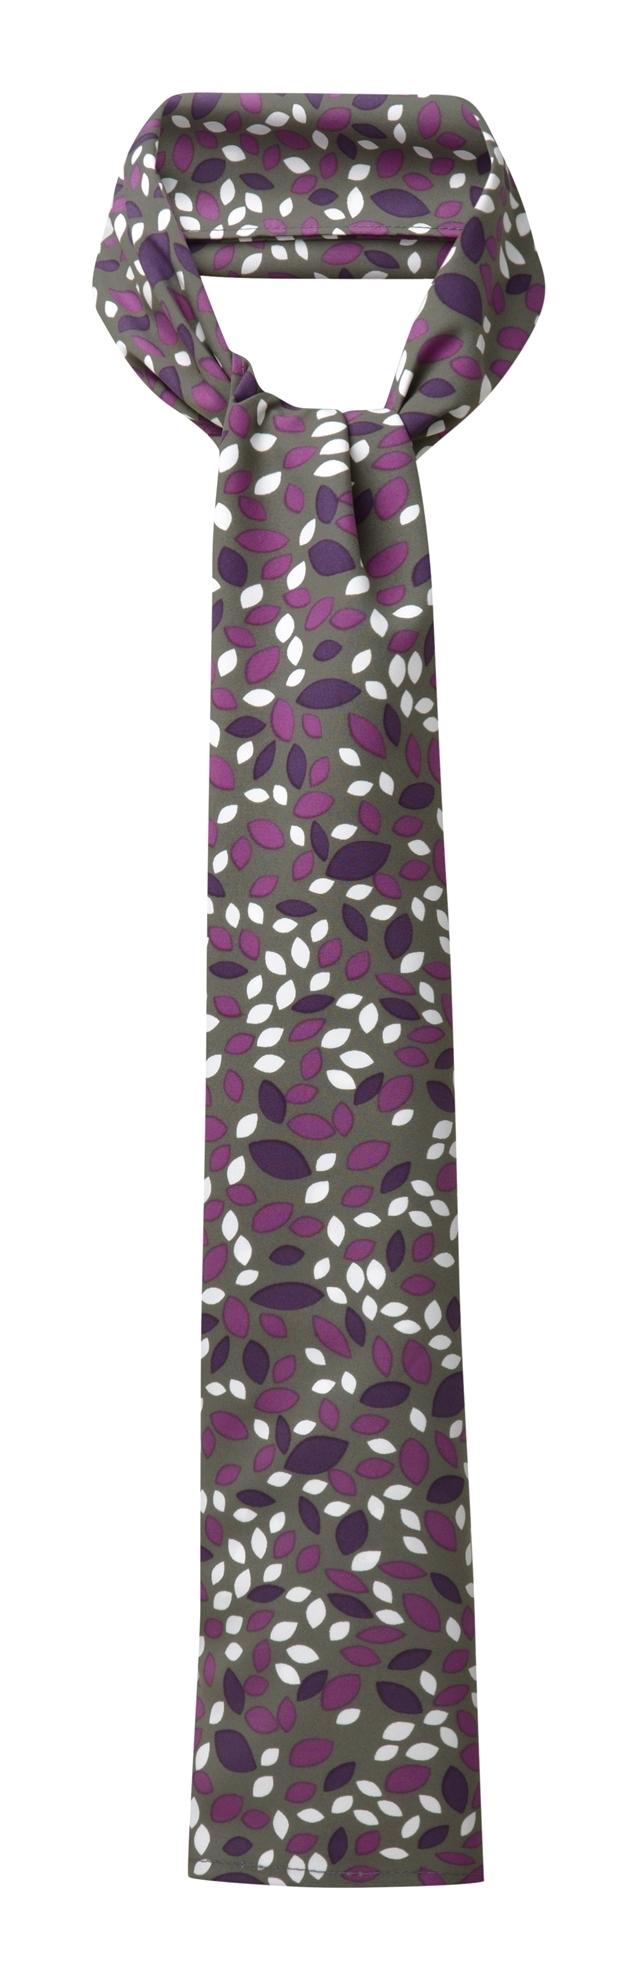 Picture of Long Scarf - Grey/Purple Lauren Print